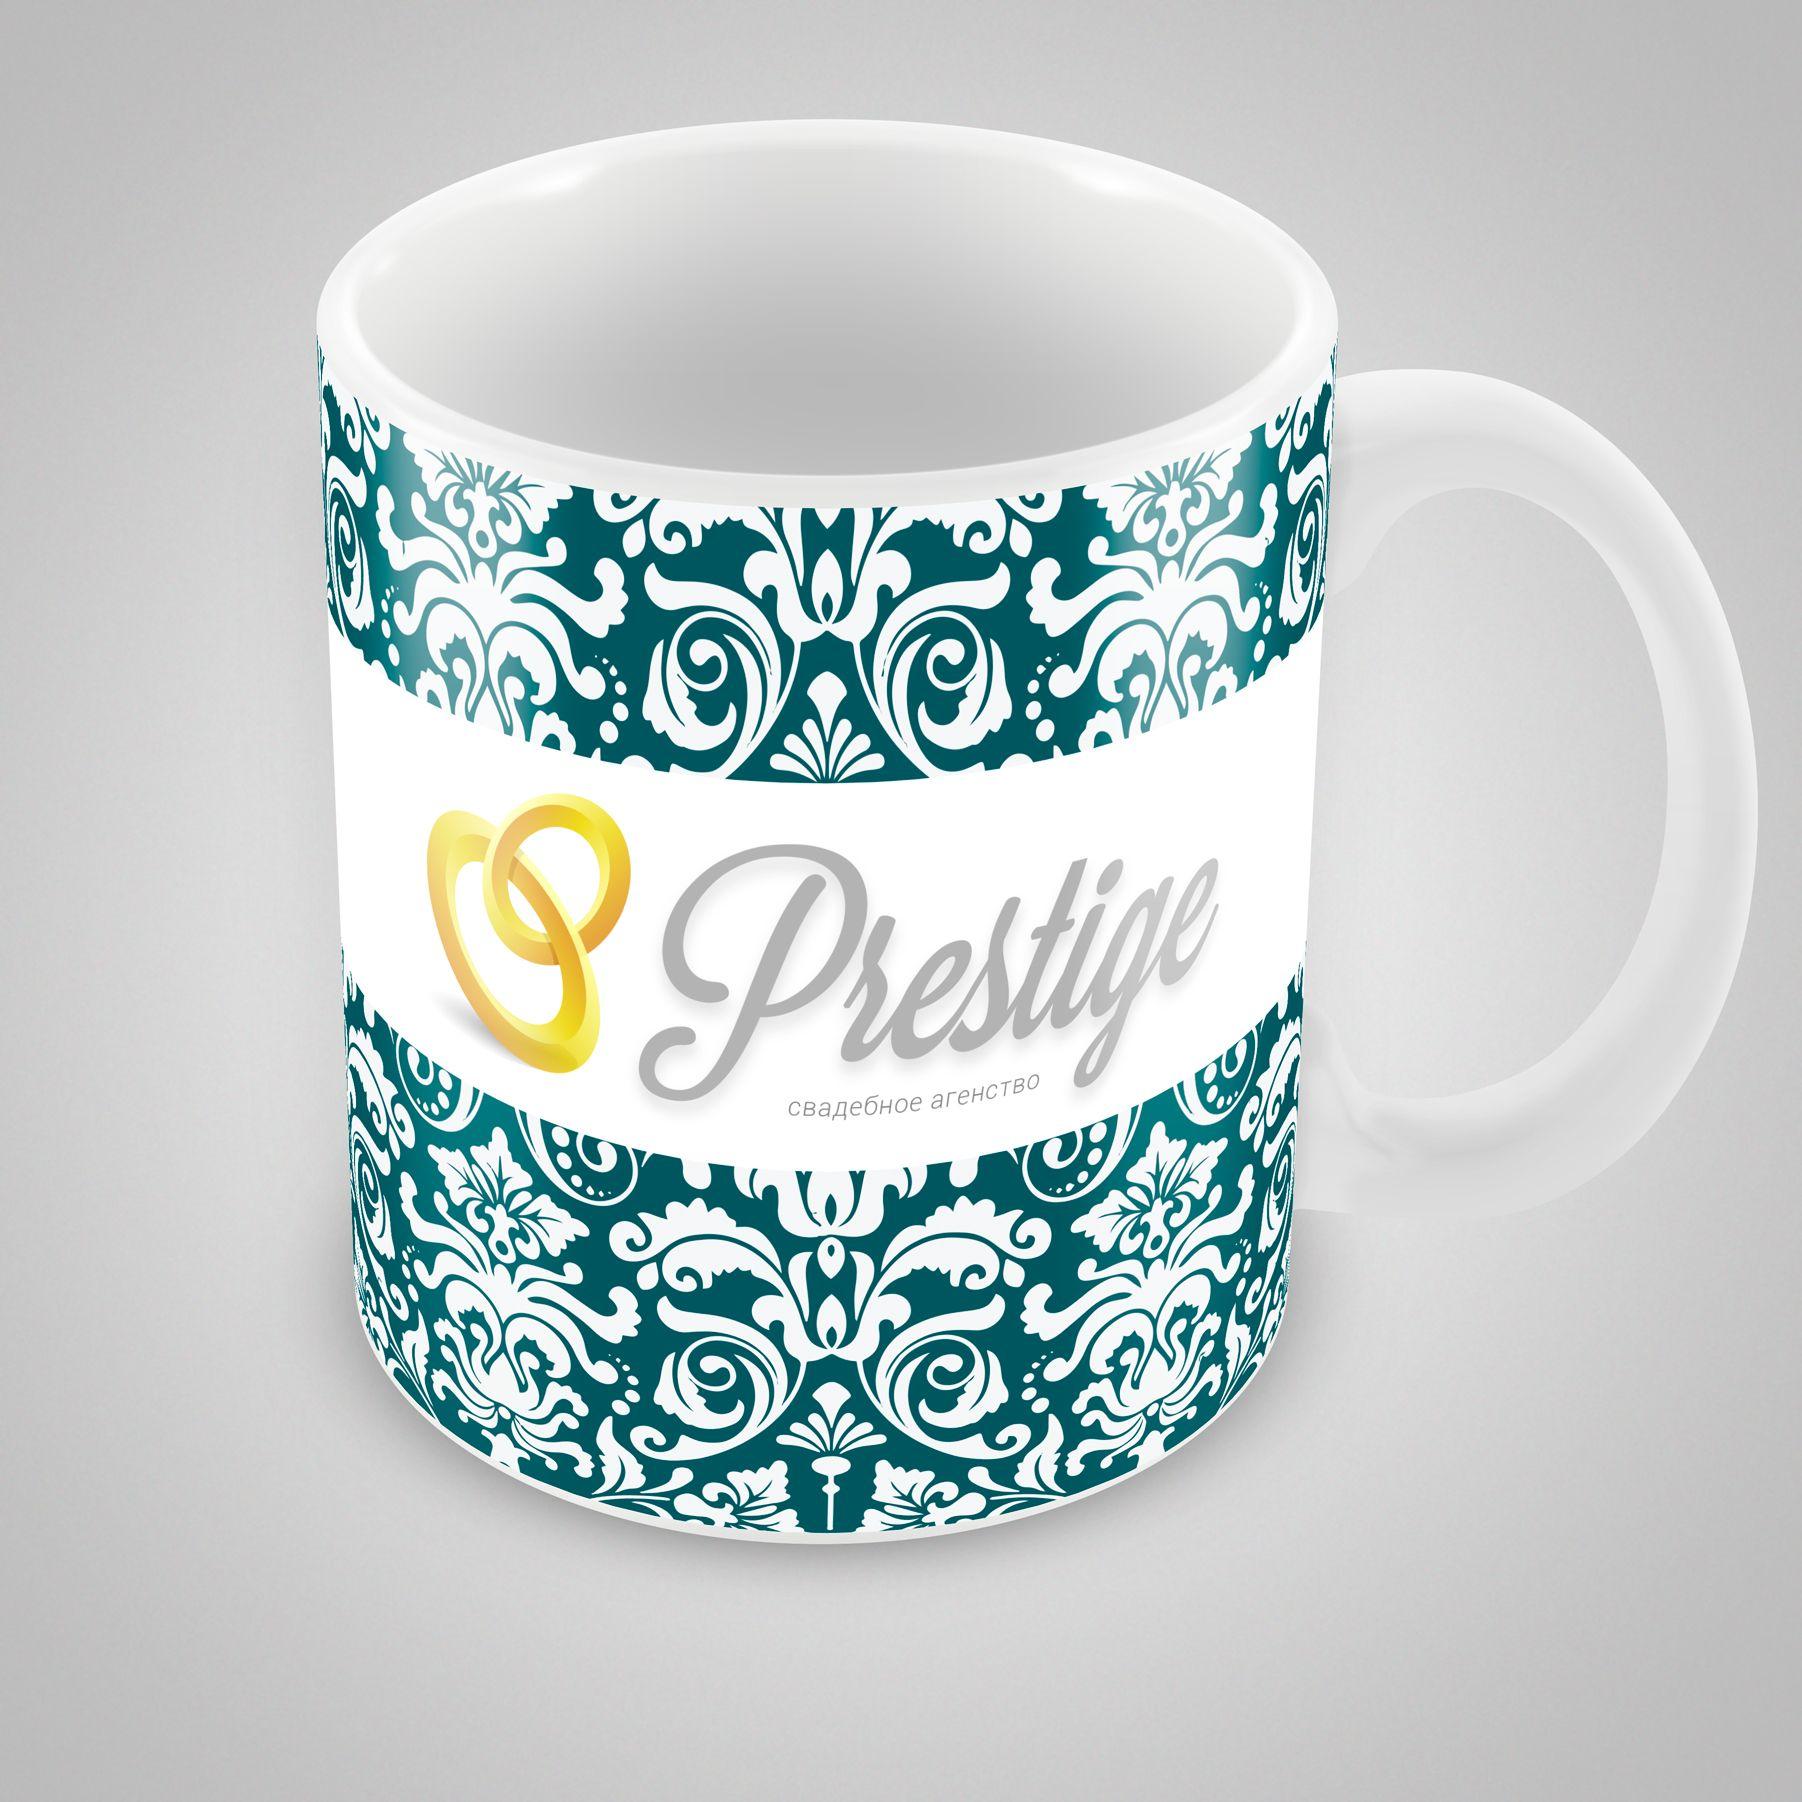 Логотип для свадебного агентства Prestige - дизайнер dmitry_banin